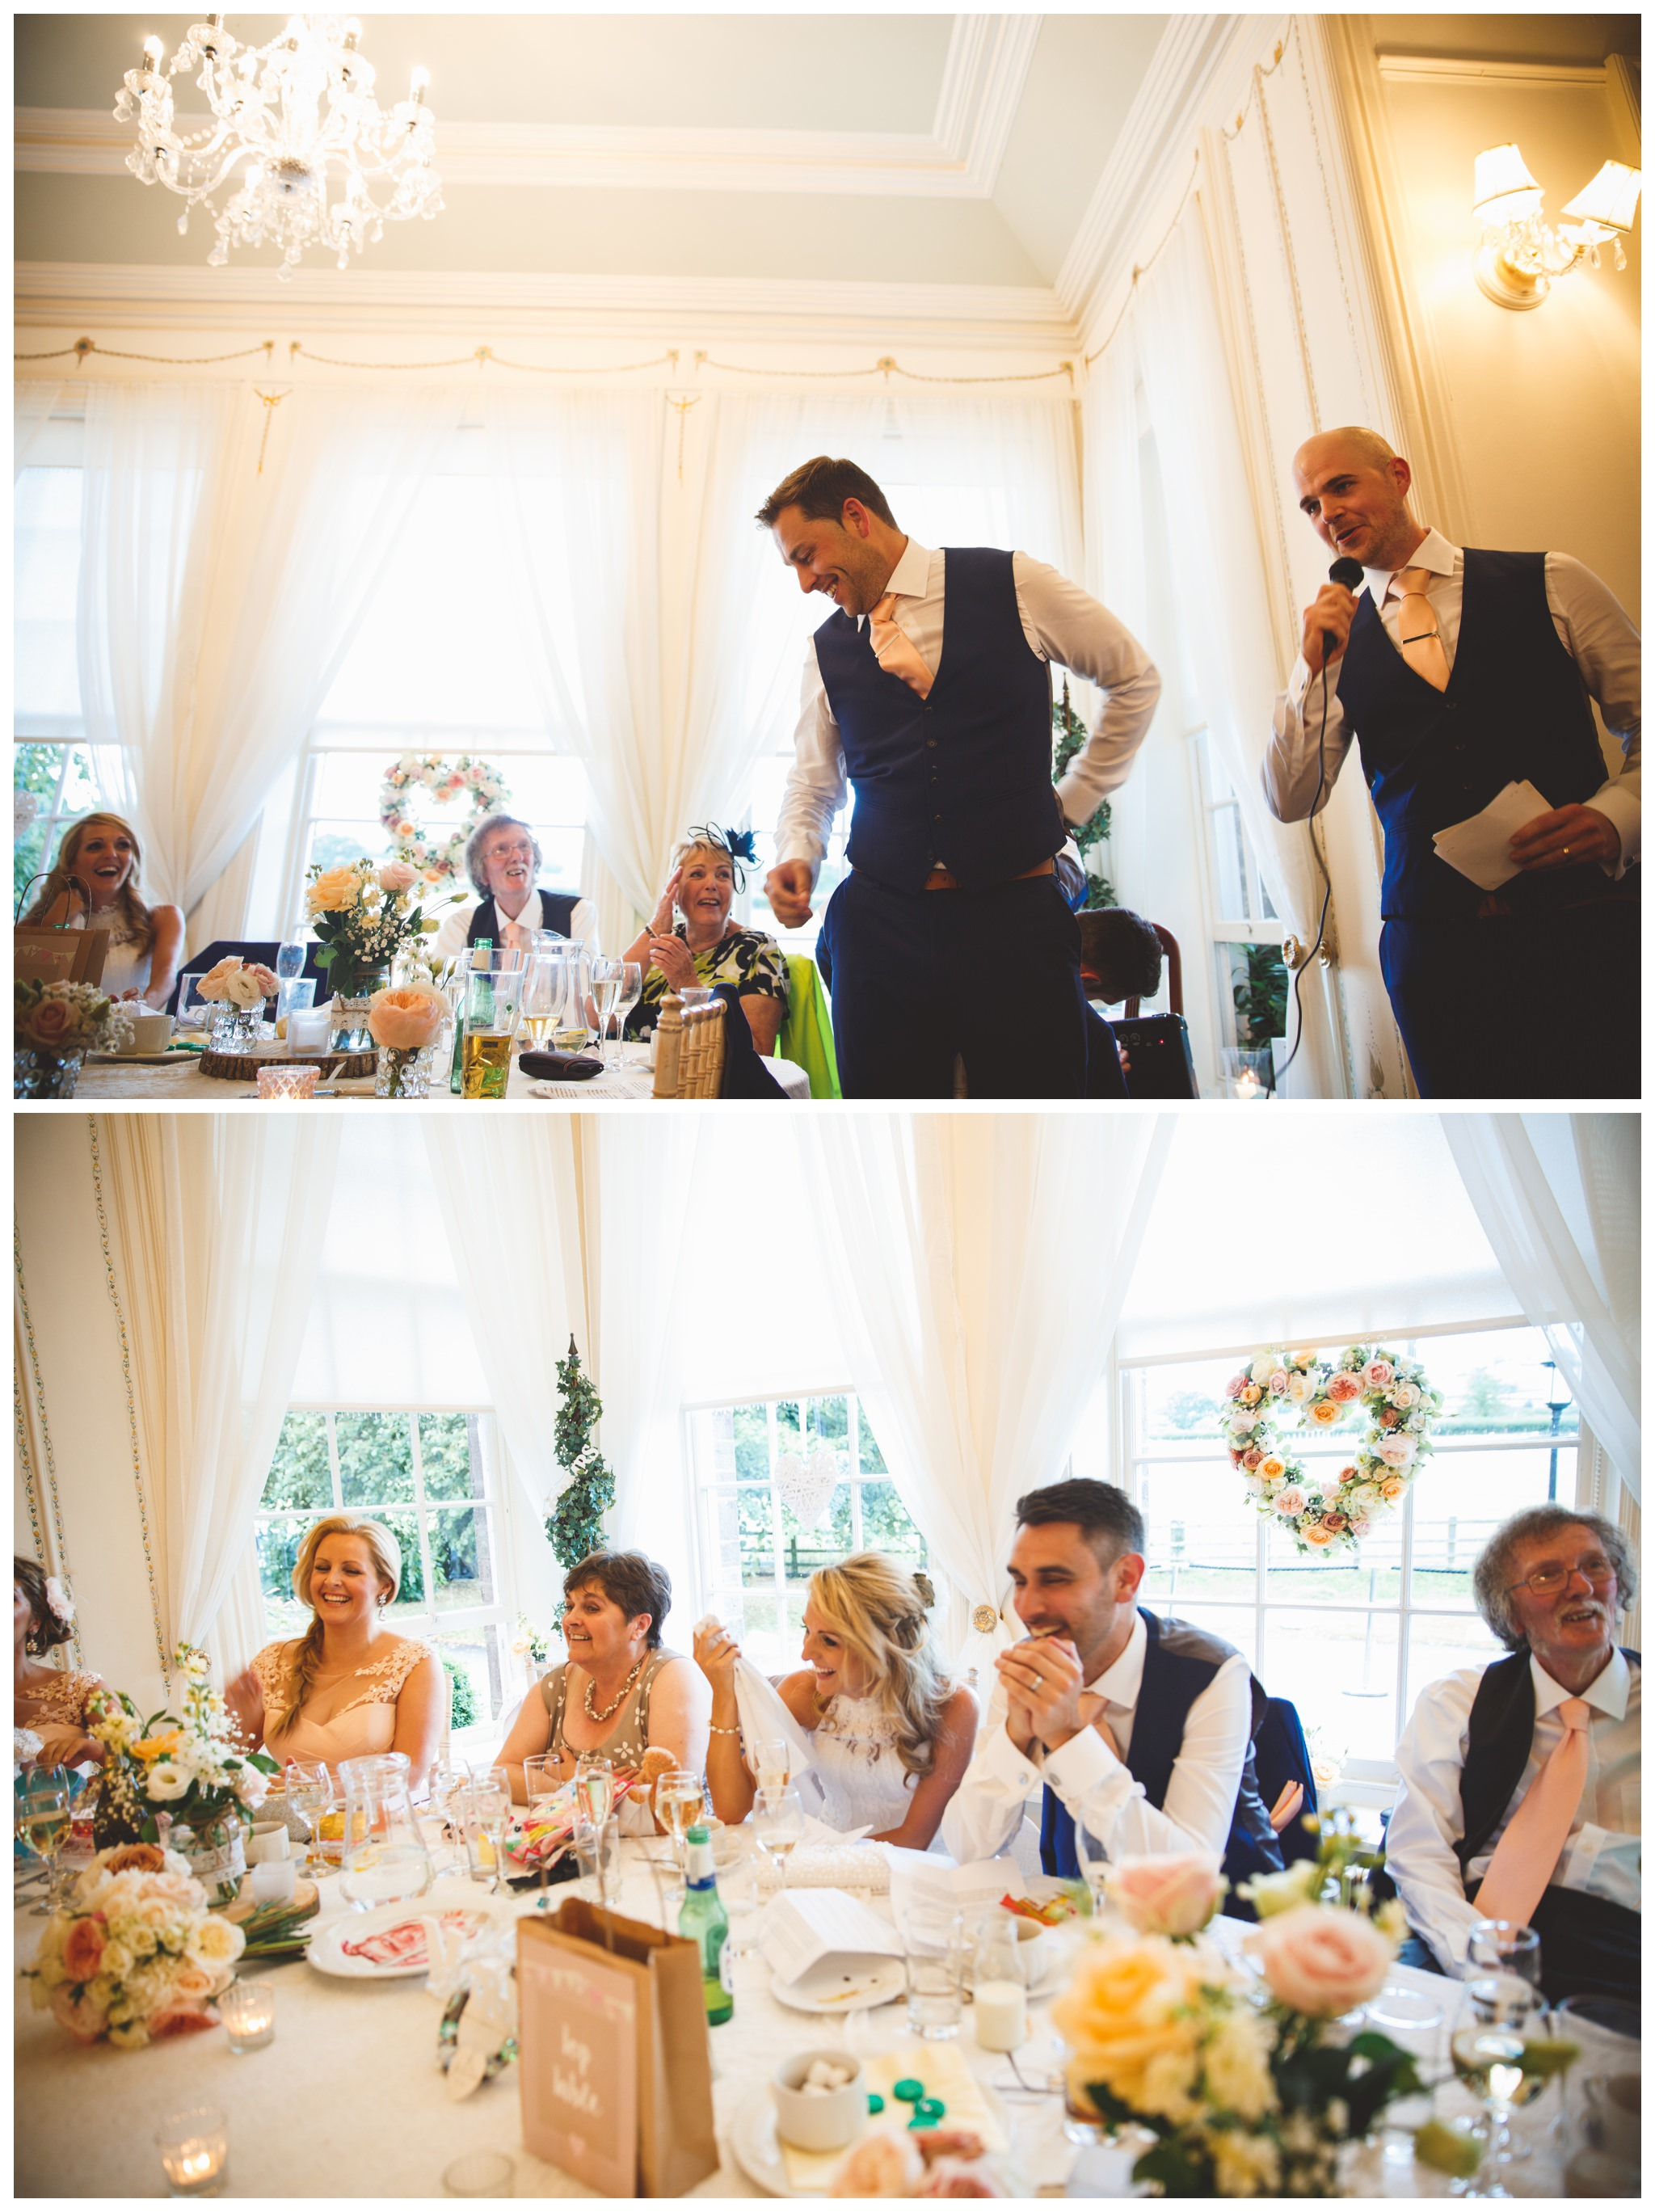 Richard Savage Photography - Wedding - Peterstone Court Brecon - 2016-05-11_0056